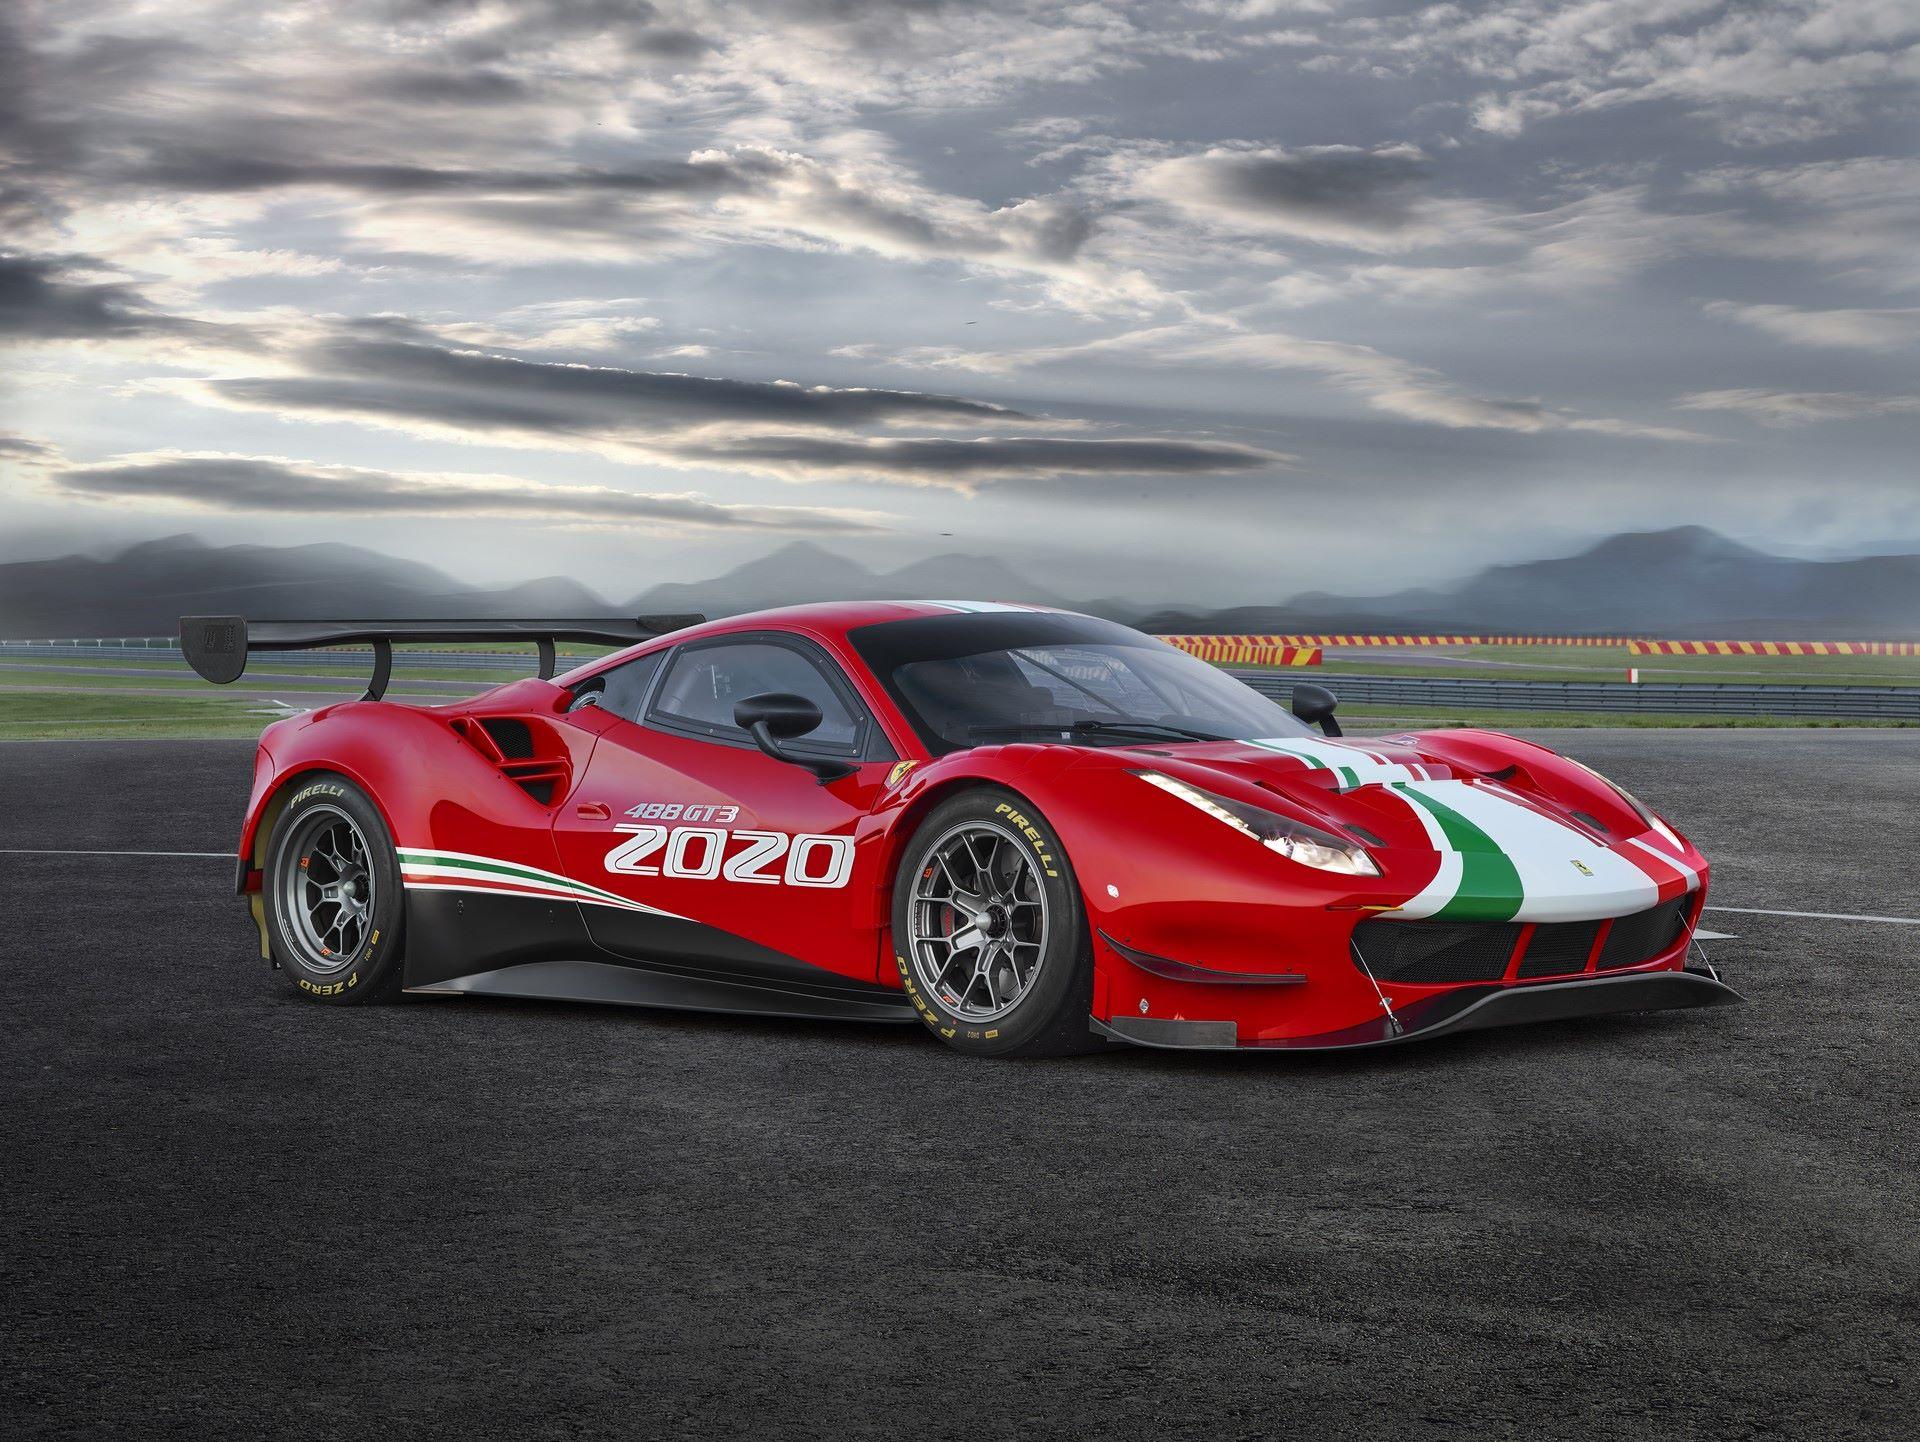 Ferrari-488-GT3-Evο-2020-1